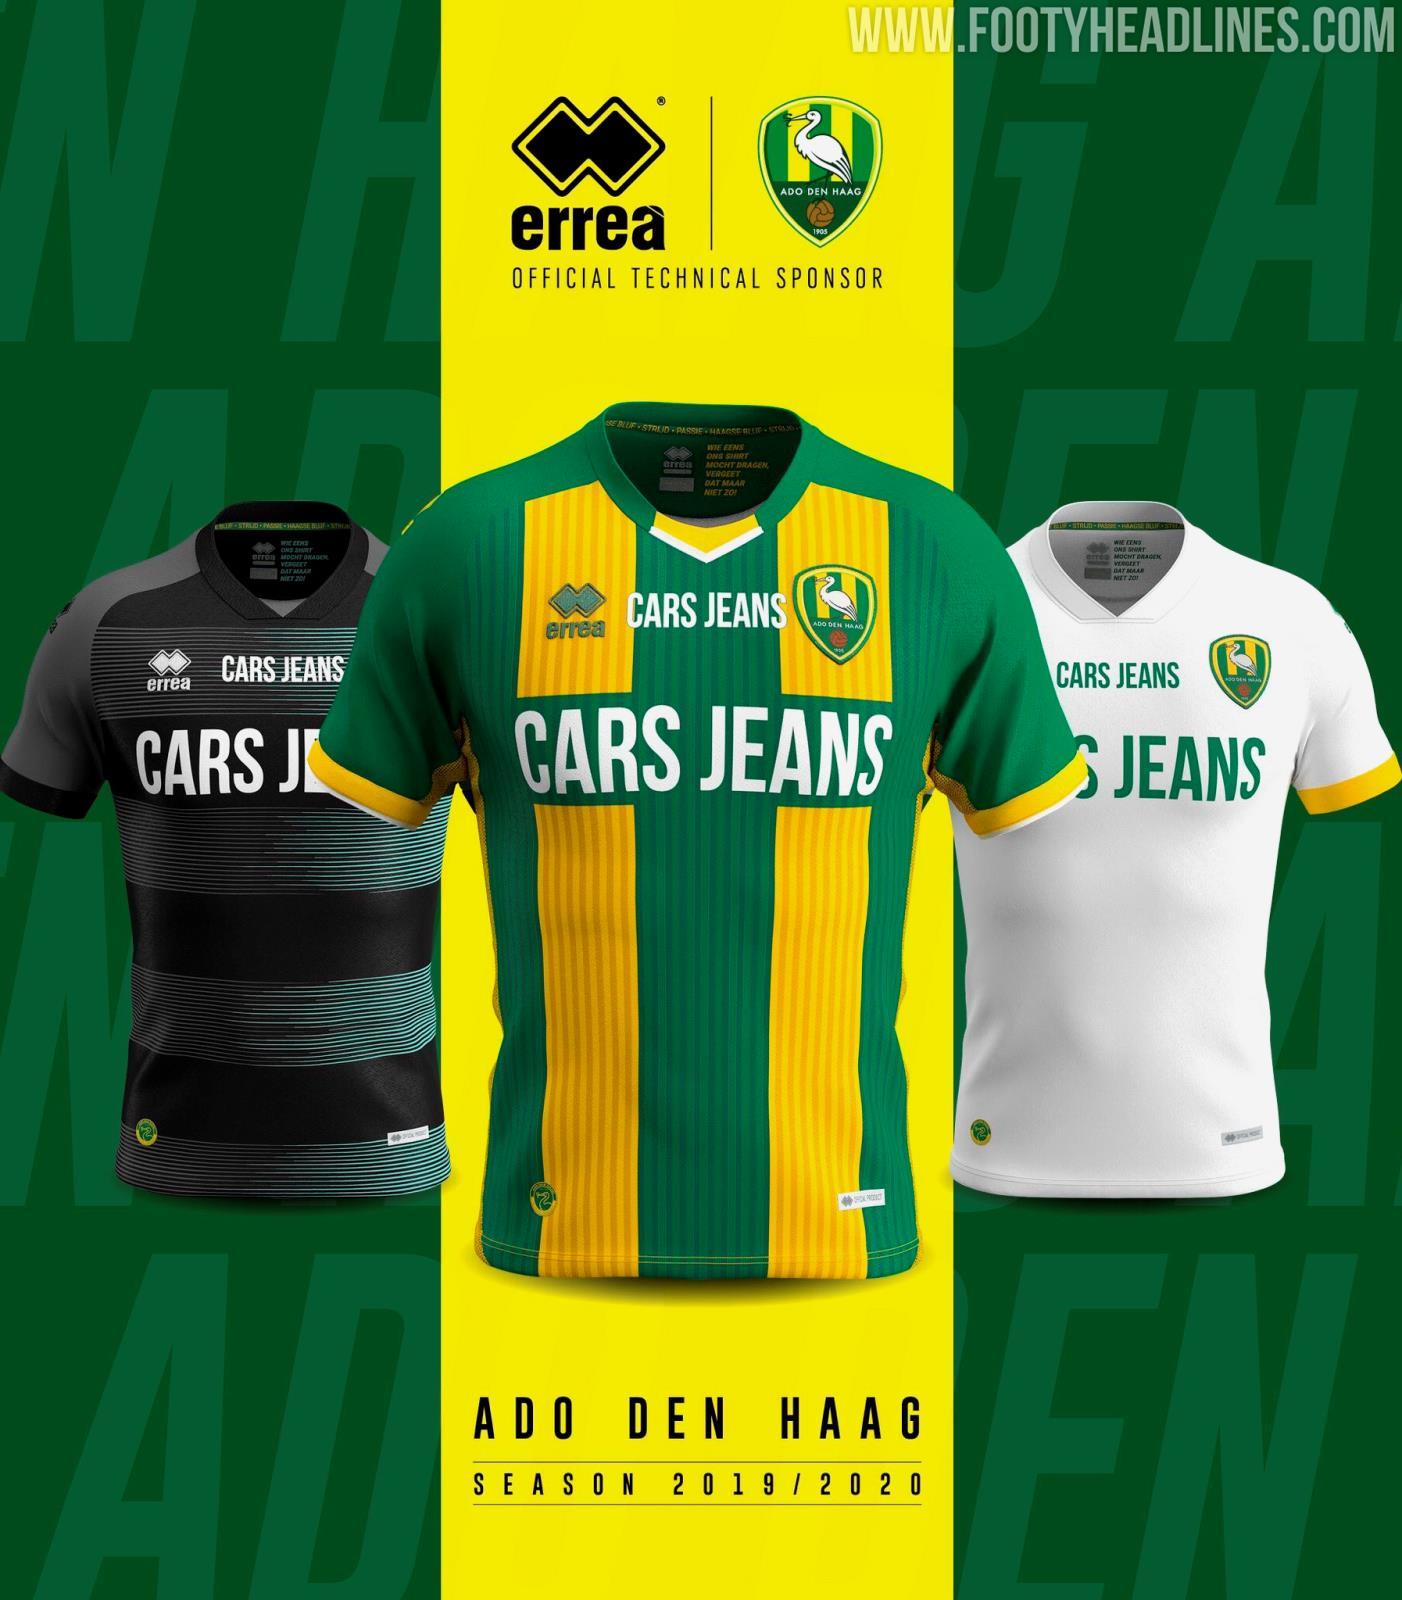 Ado Den Haag 19 20 Home Away Third Kits Released Footy Headlines